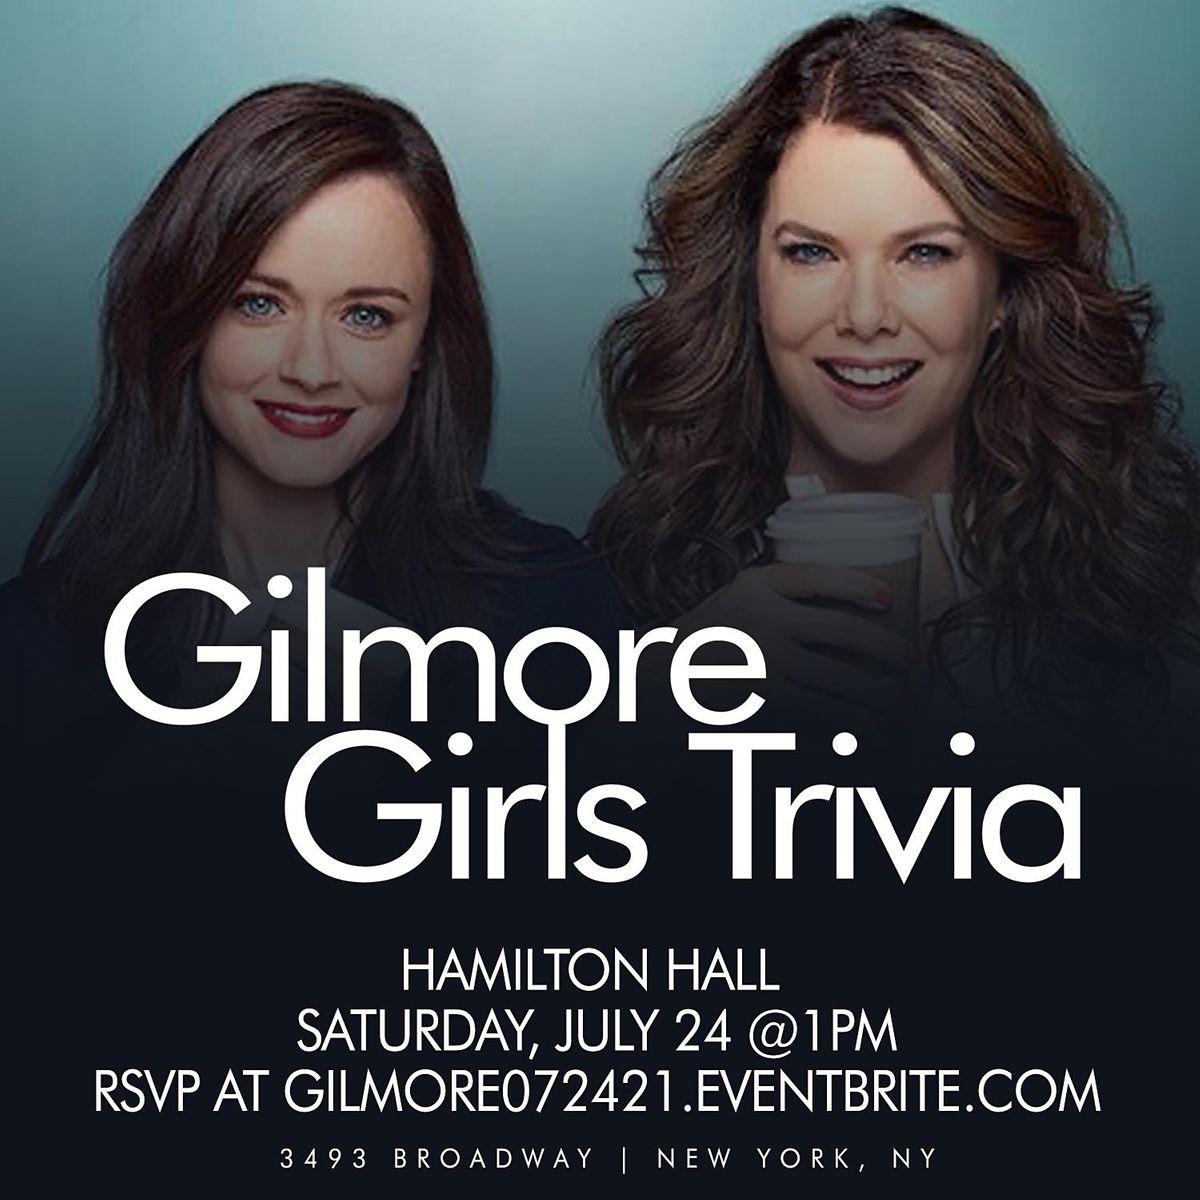 Gilmore Girls Trivia